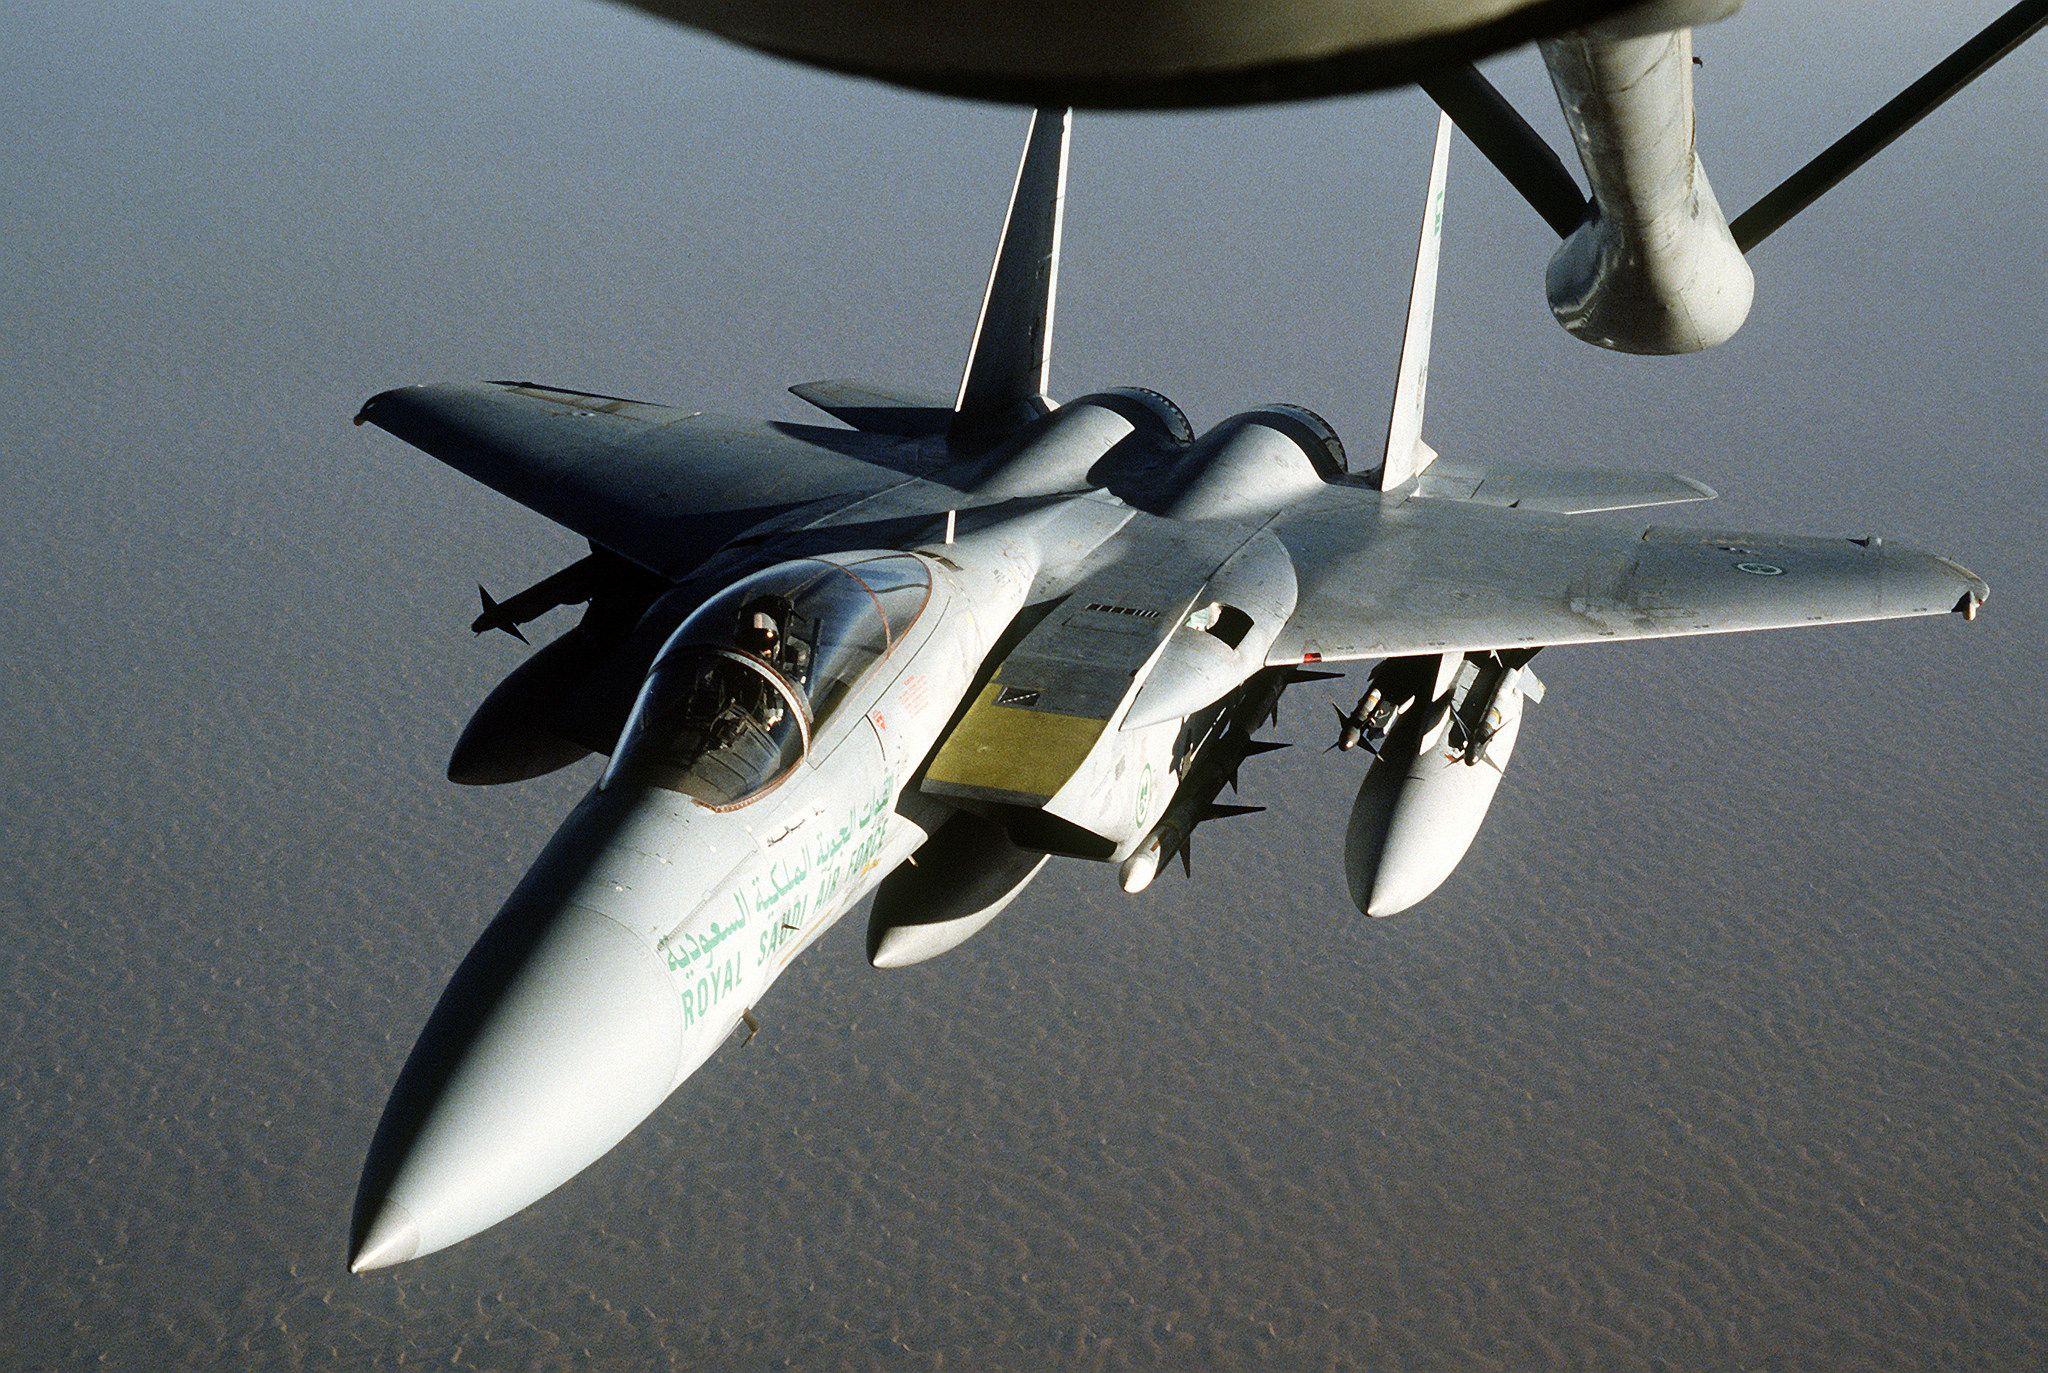 Royal Saudi Air Force F-15 Eagle